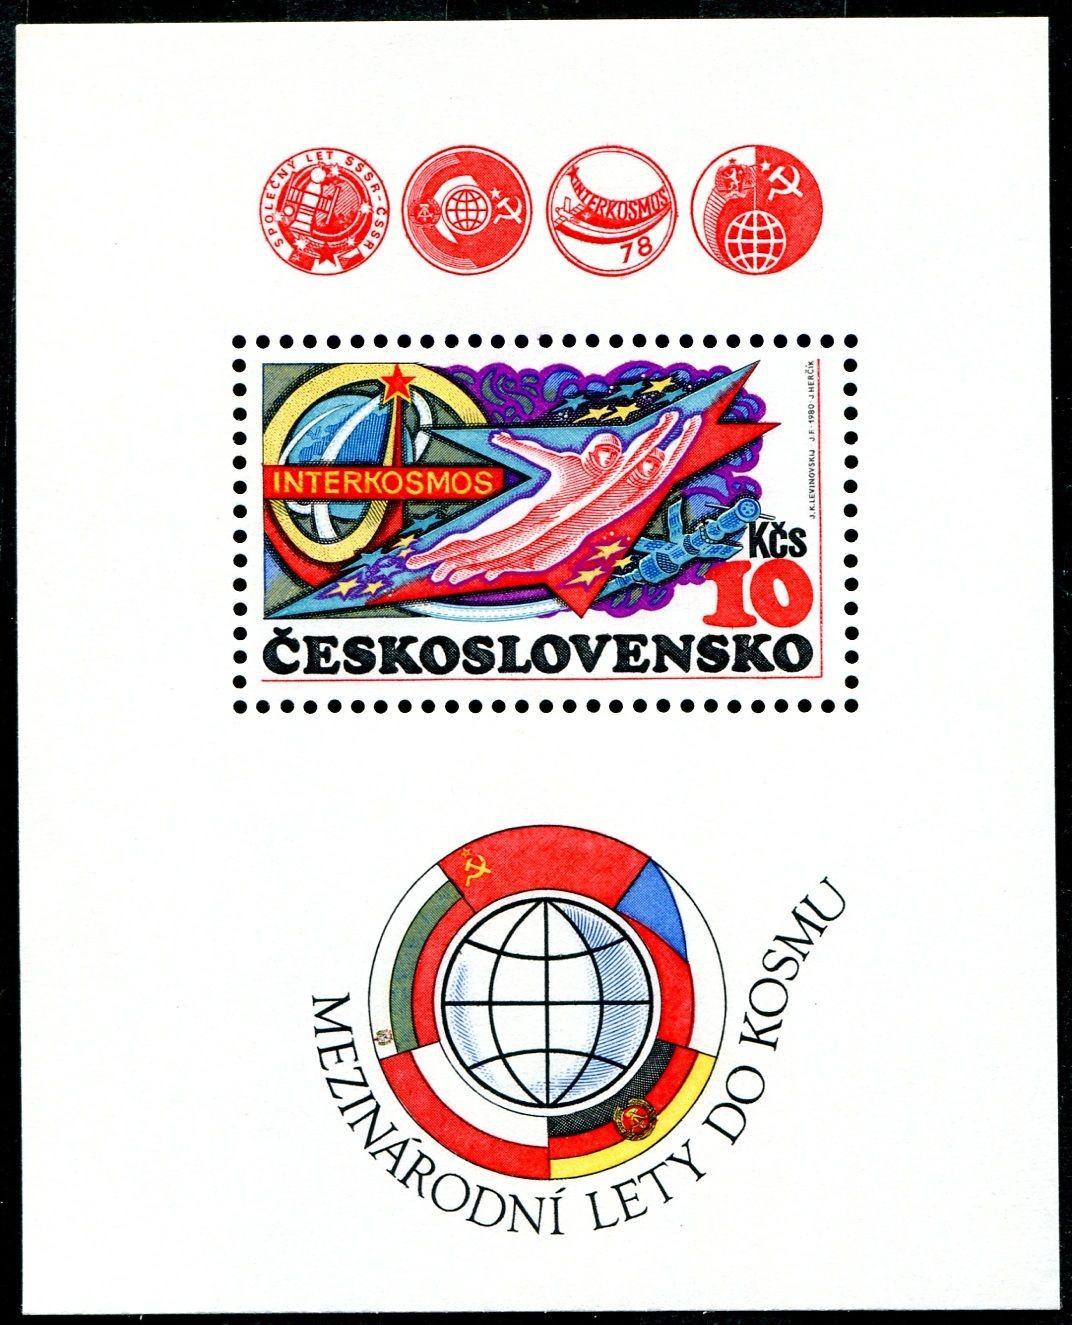 (1980) A 2434 A - II. typ  ** - Československo - Interkosmos